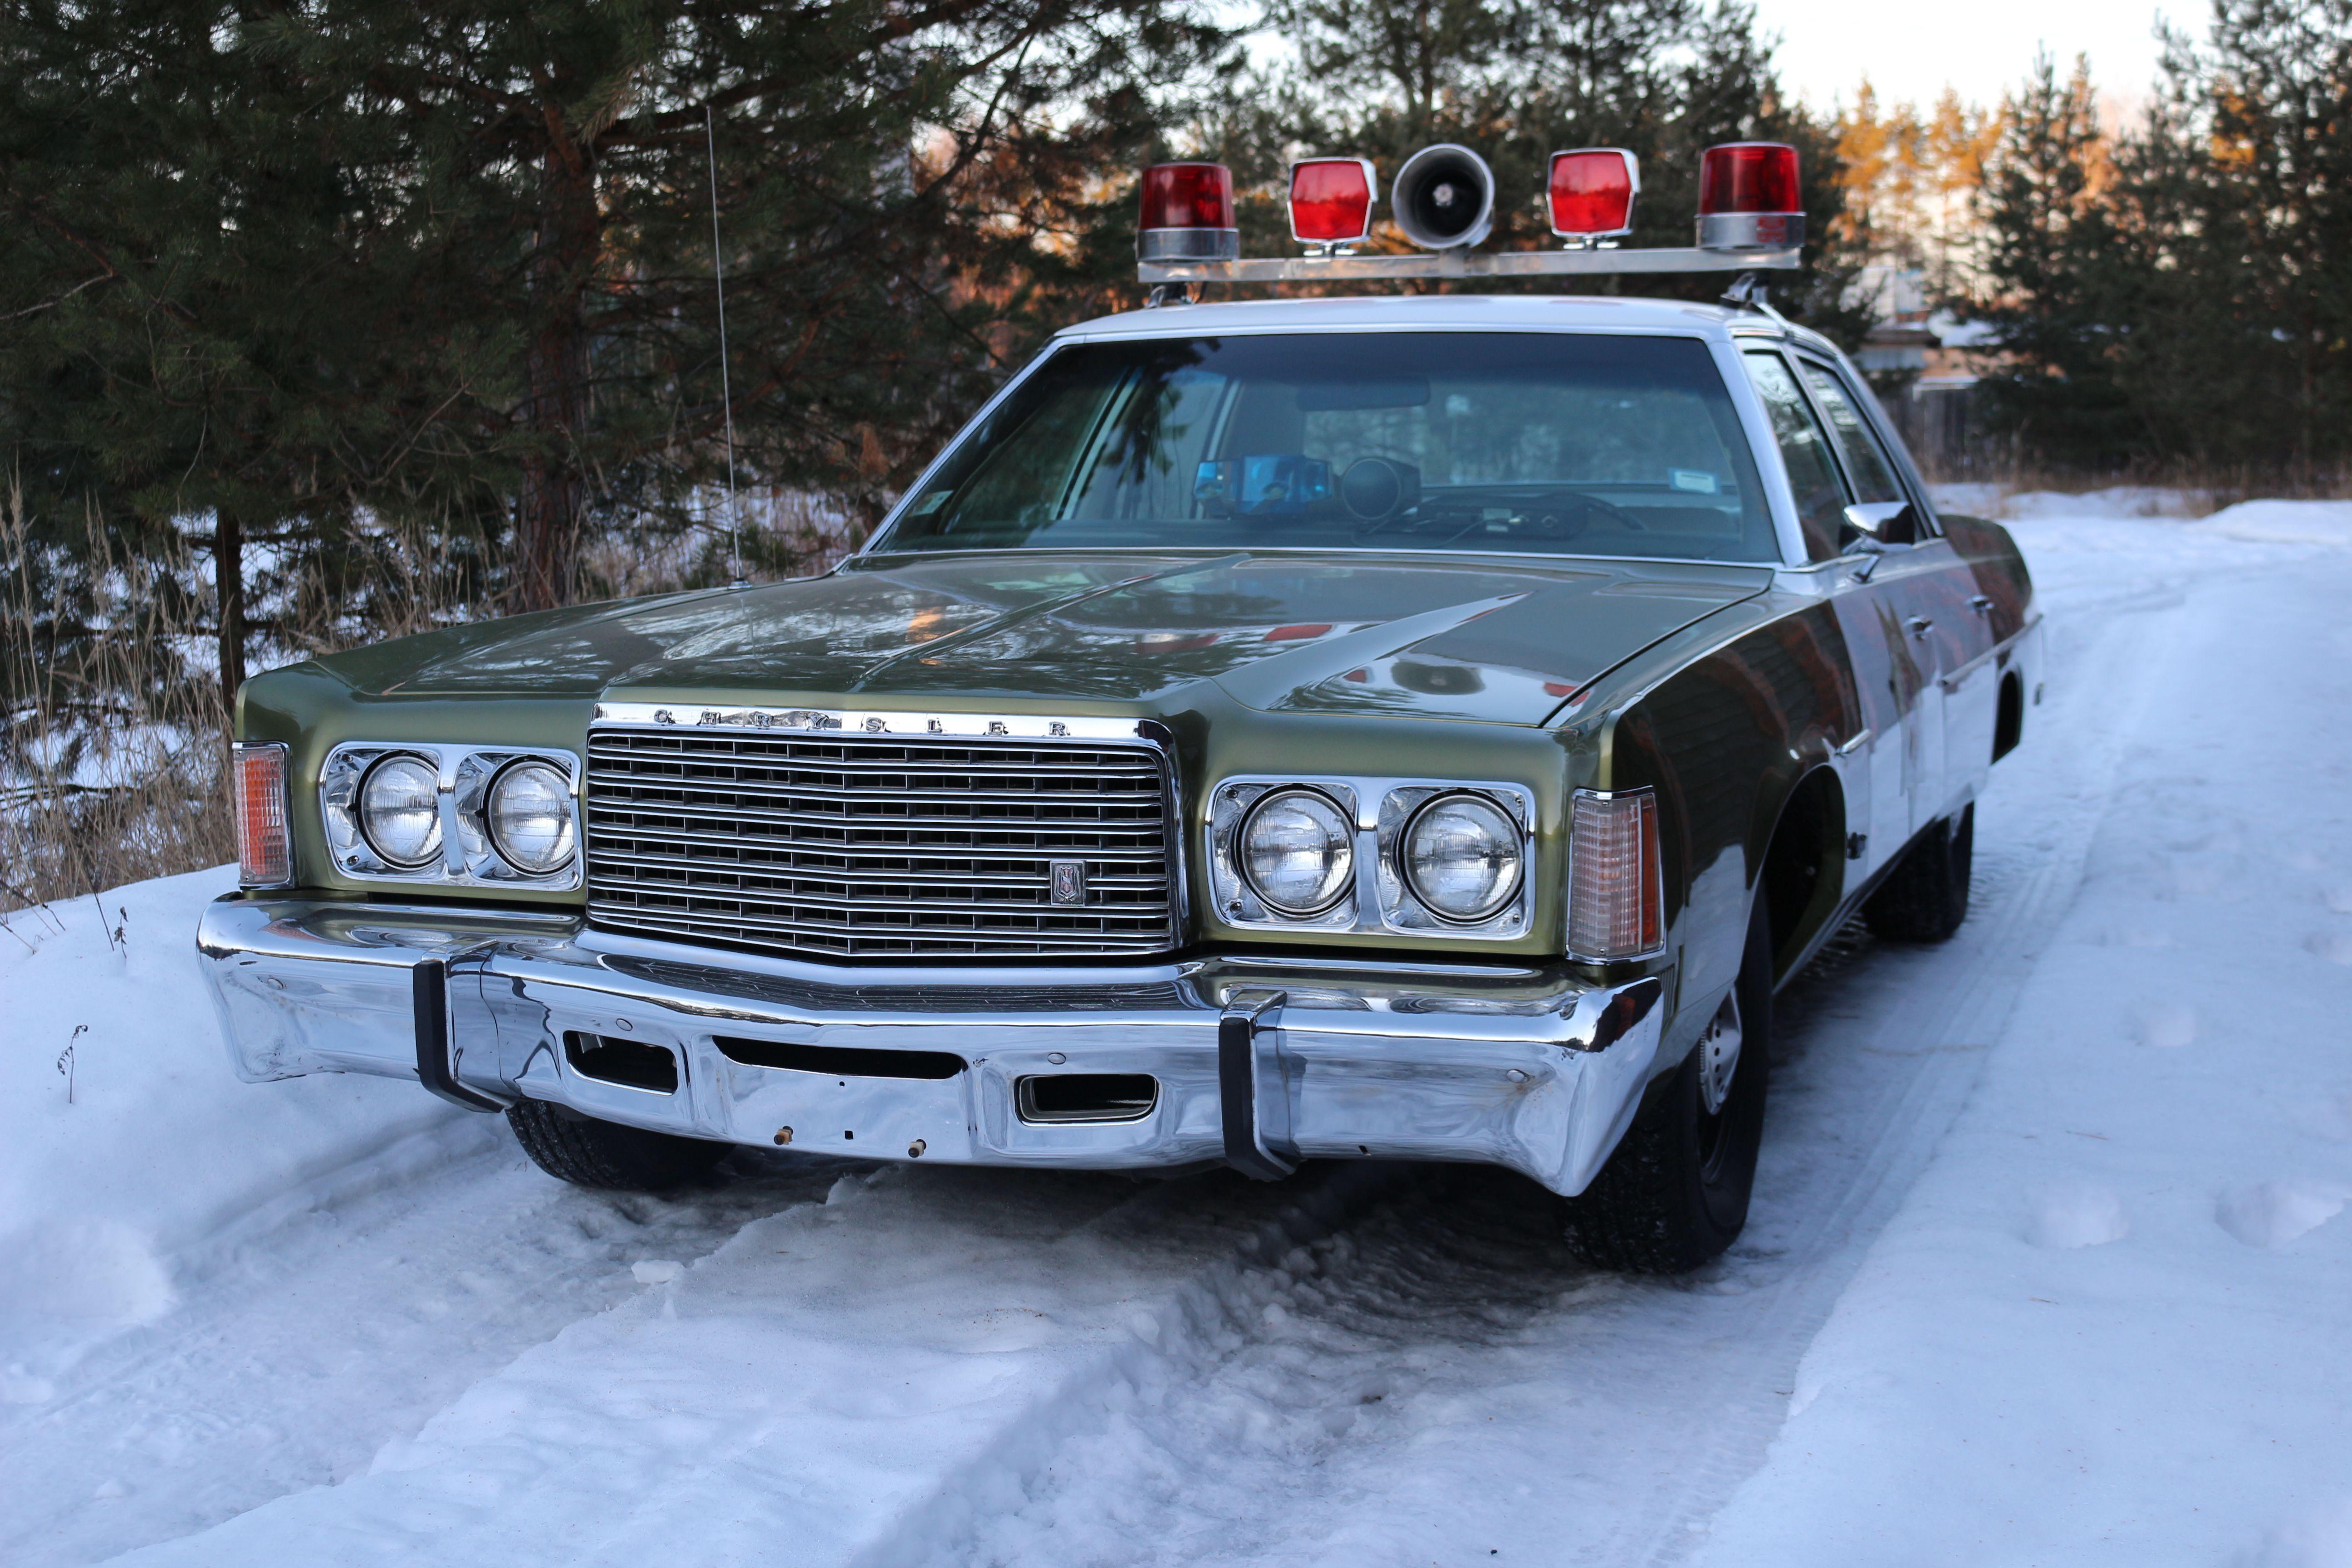 My 1975 Chrysler Newport Florida Sheriff tribute